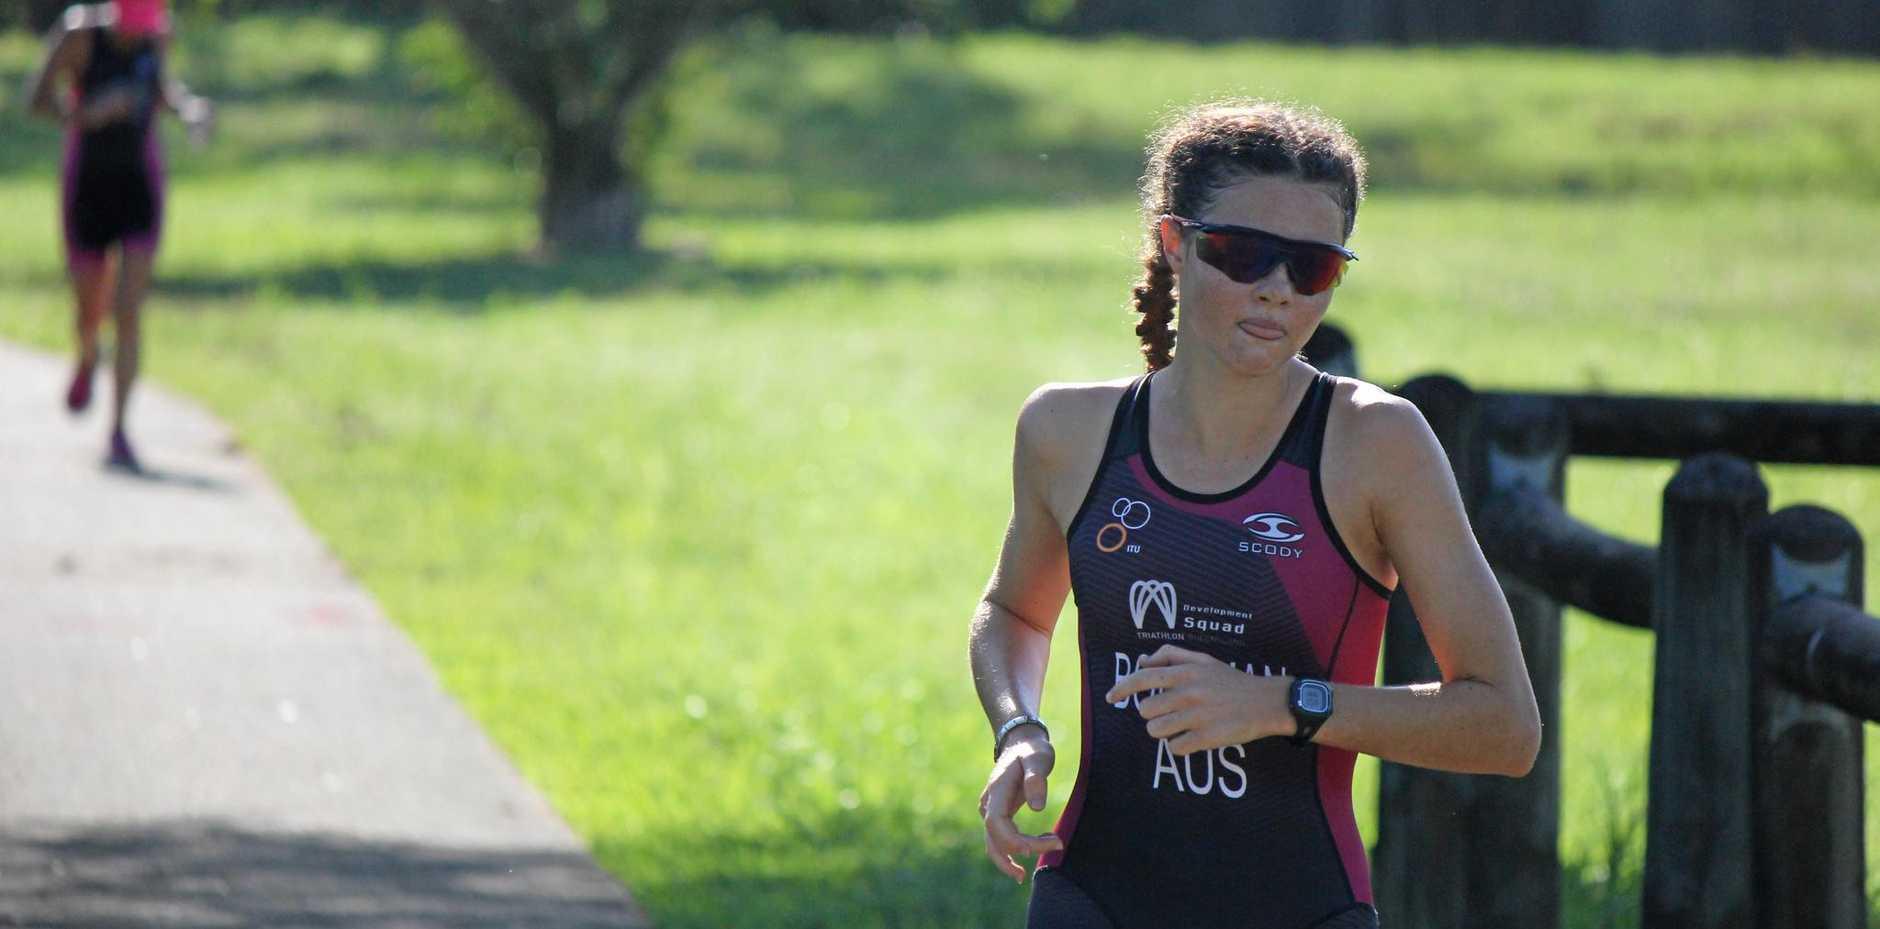 The overall winner of the Sonya Brazil Memorial Women's Only Triathlon, Jamie Bornman.